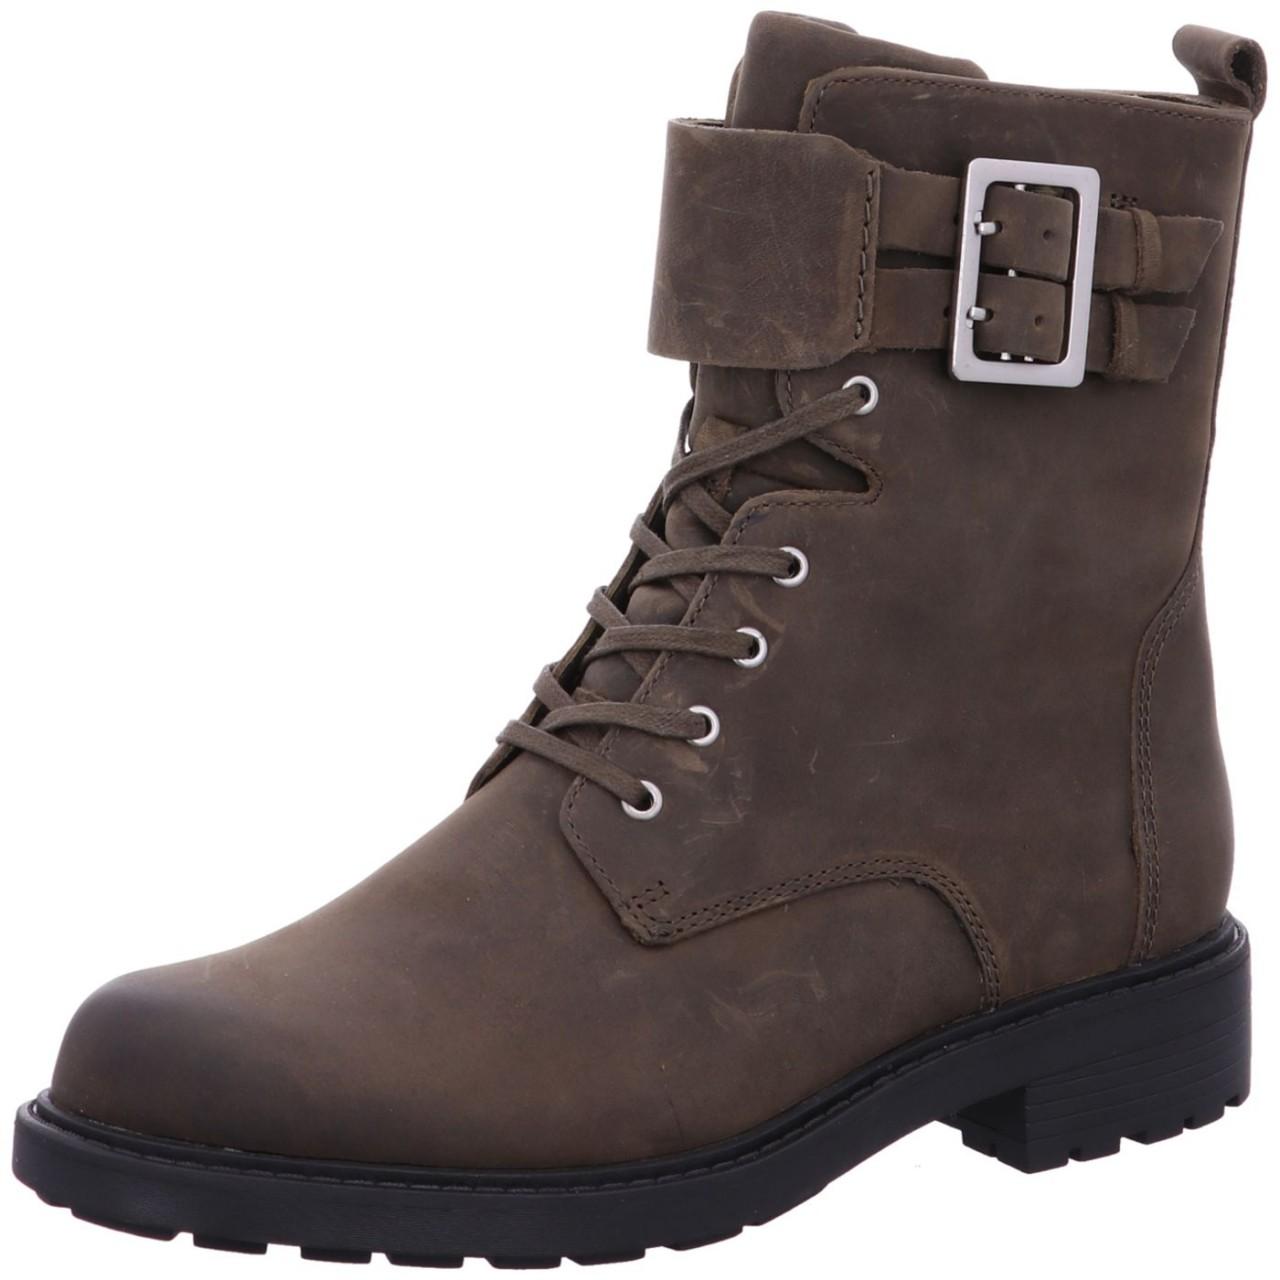 Clarks Boot Orinoco 2 Lace Grün 26153928 Orinoco 2 Lace dolive